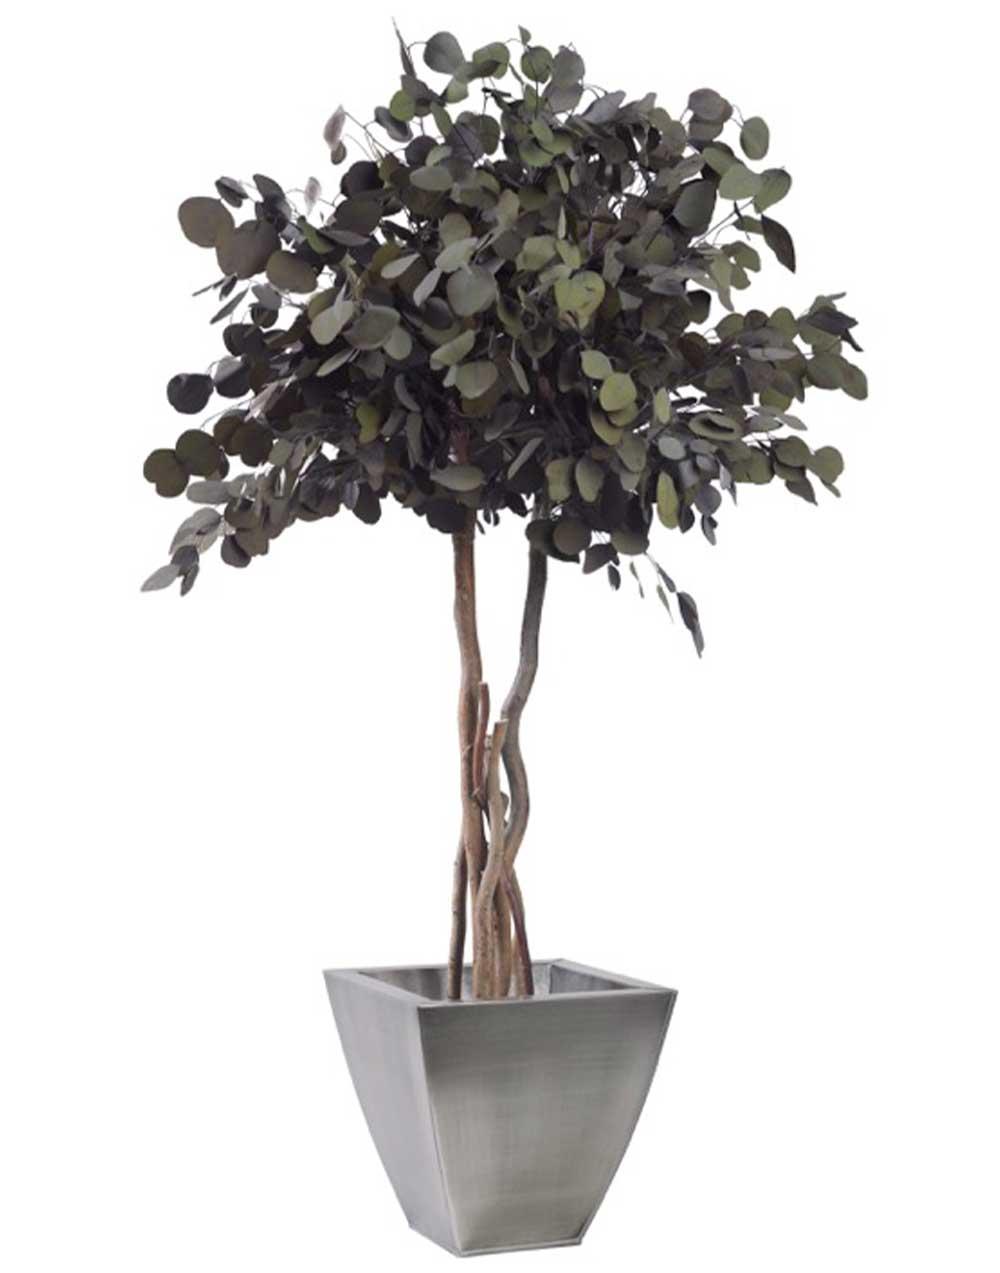 Stabilized plant crown